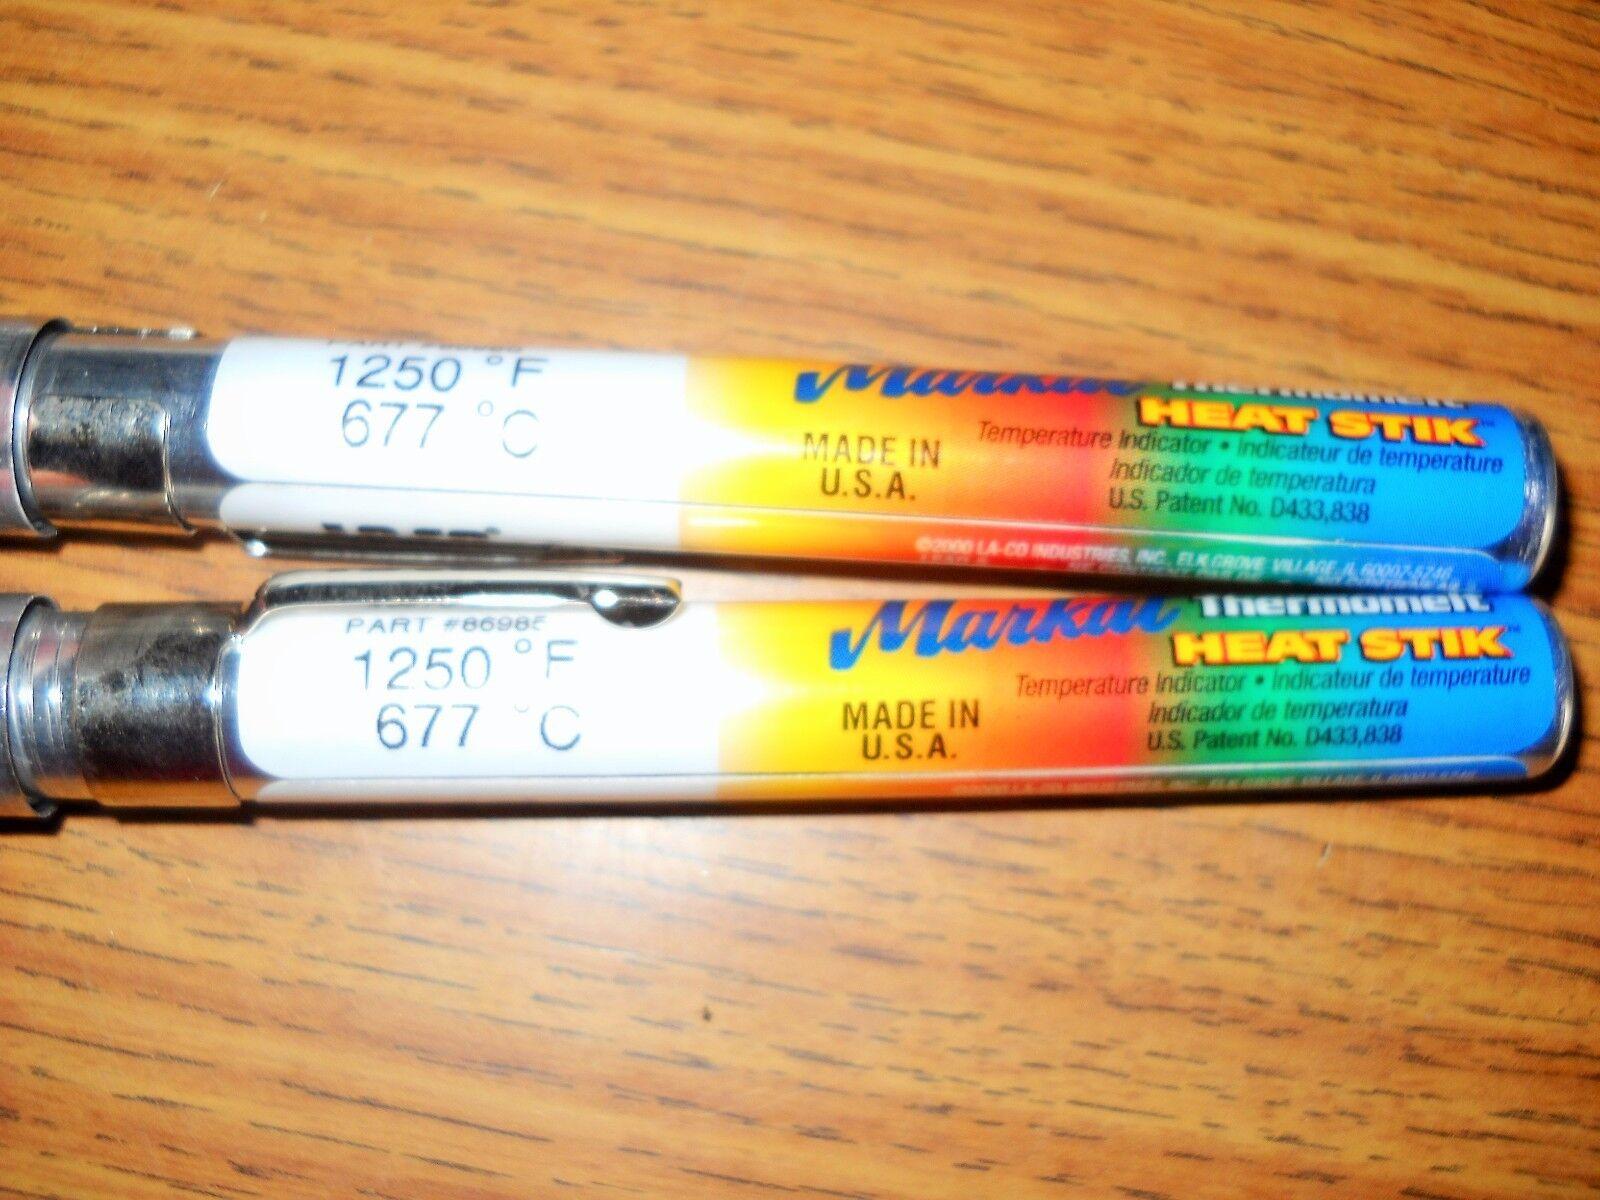 125F//54C MARKAL Thermomelt HEAT-STIK Temperature Indicating Stick